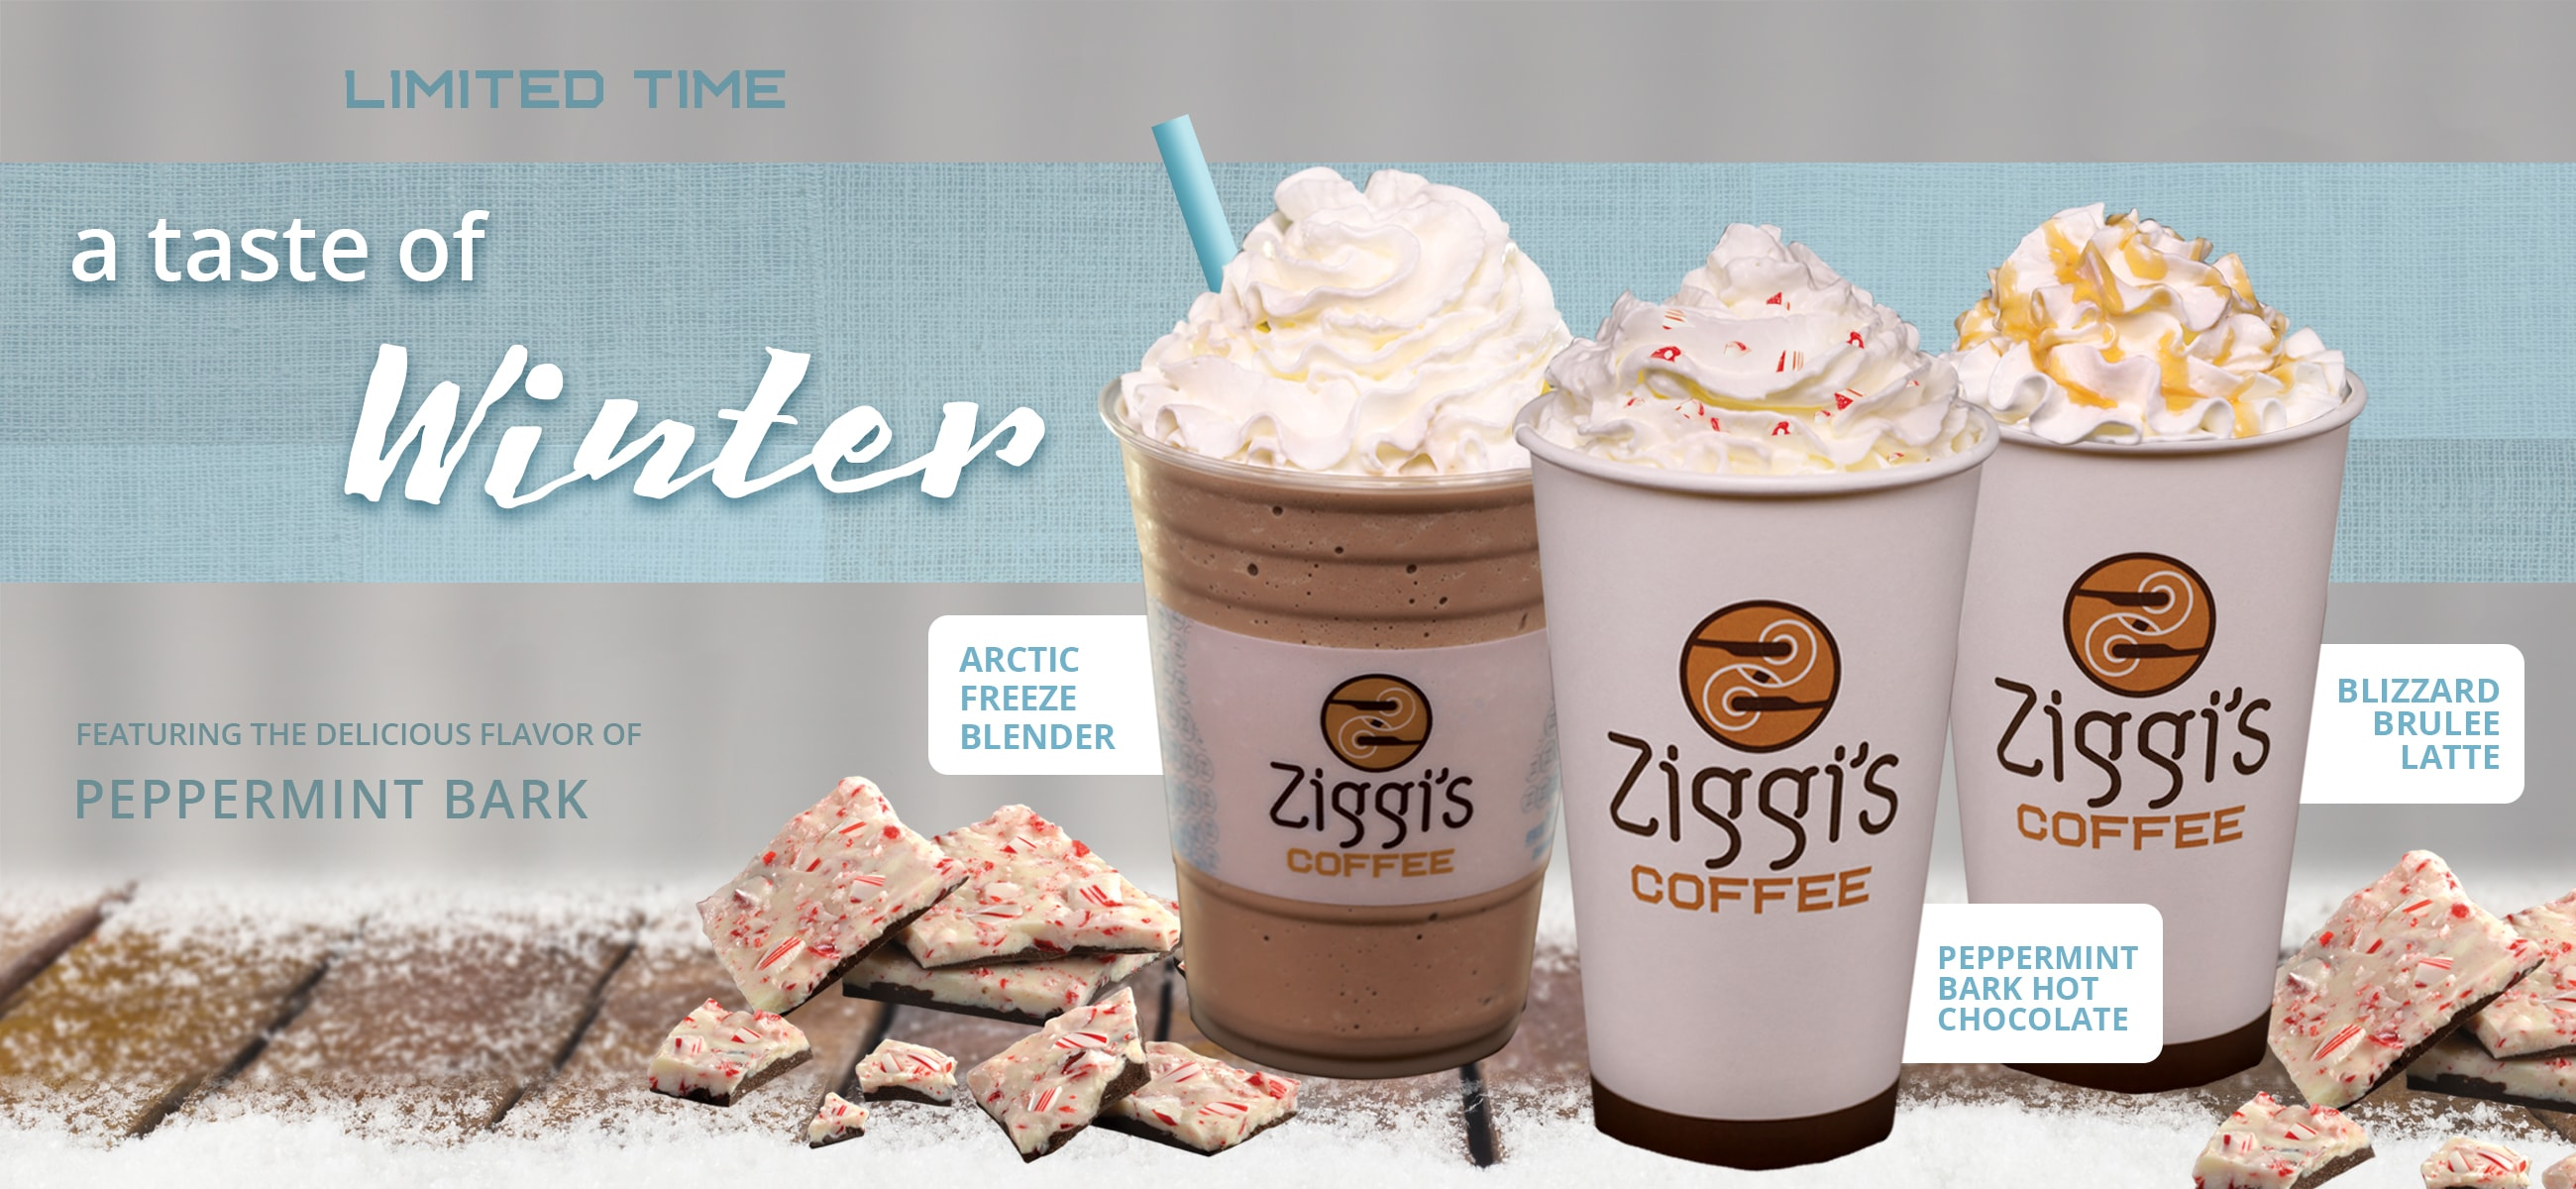 Photo of Ziggi's Coffee peppermint bark holiday drinks